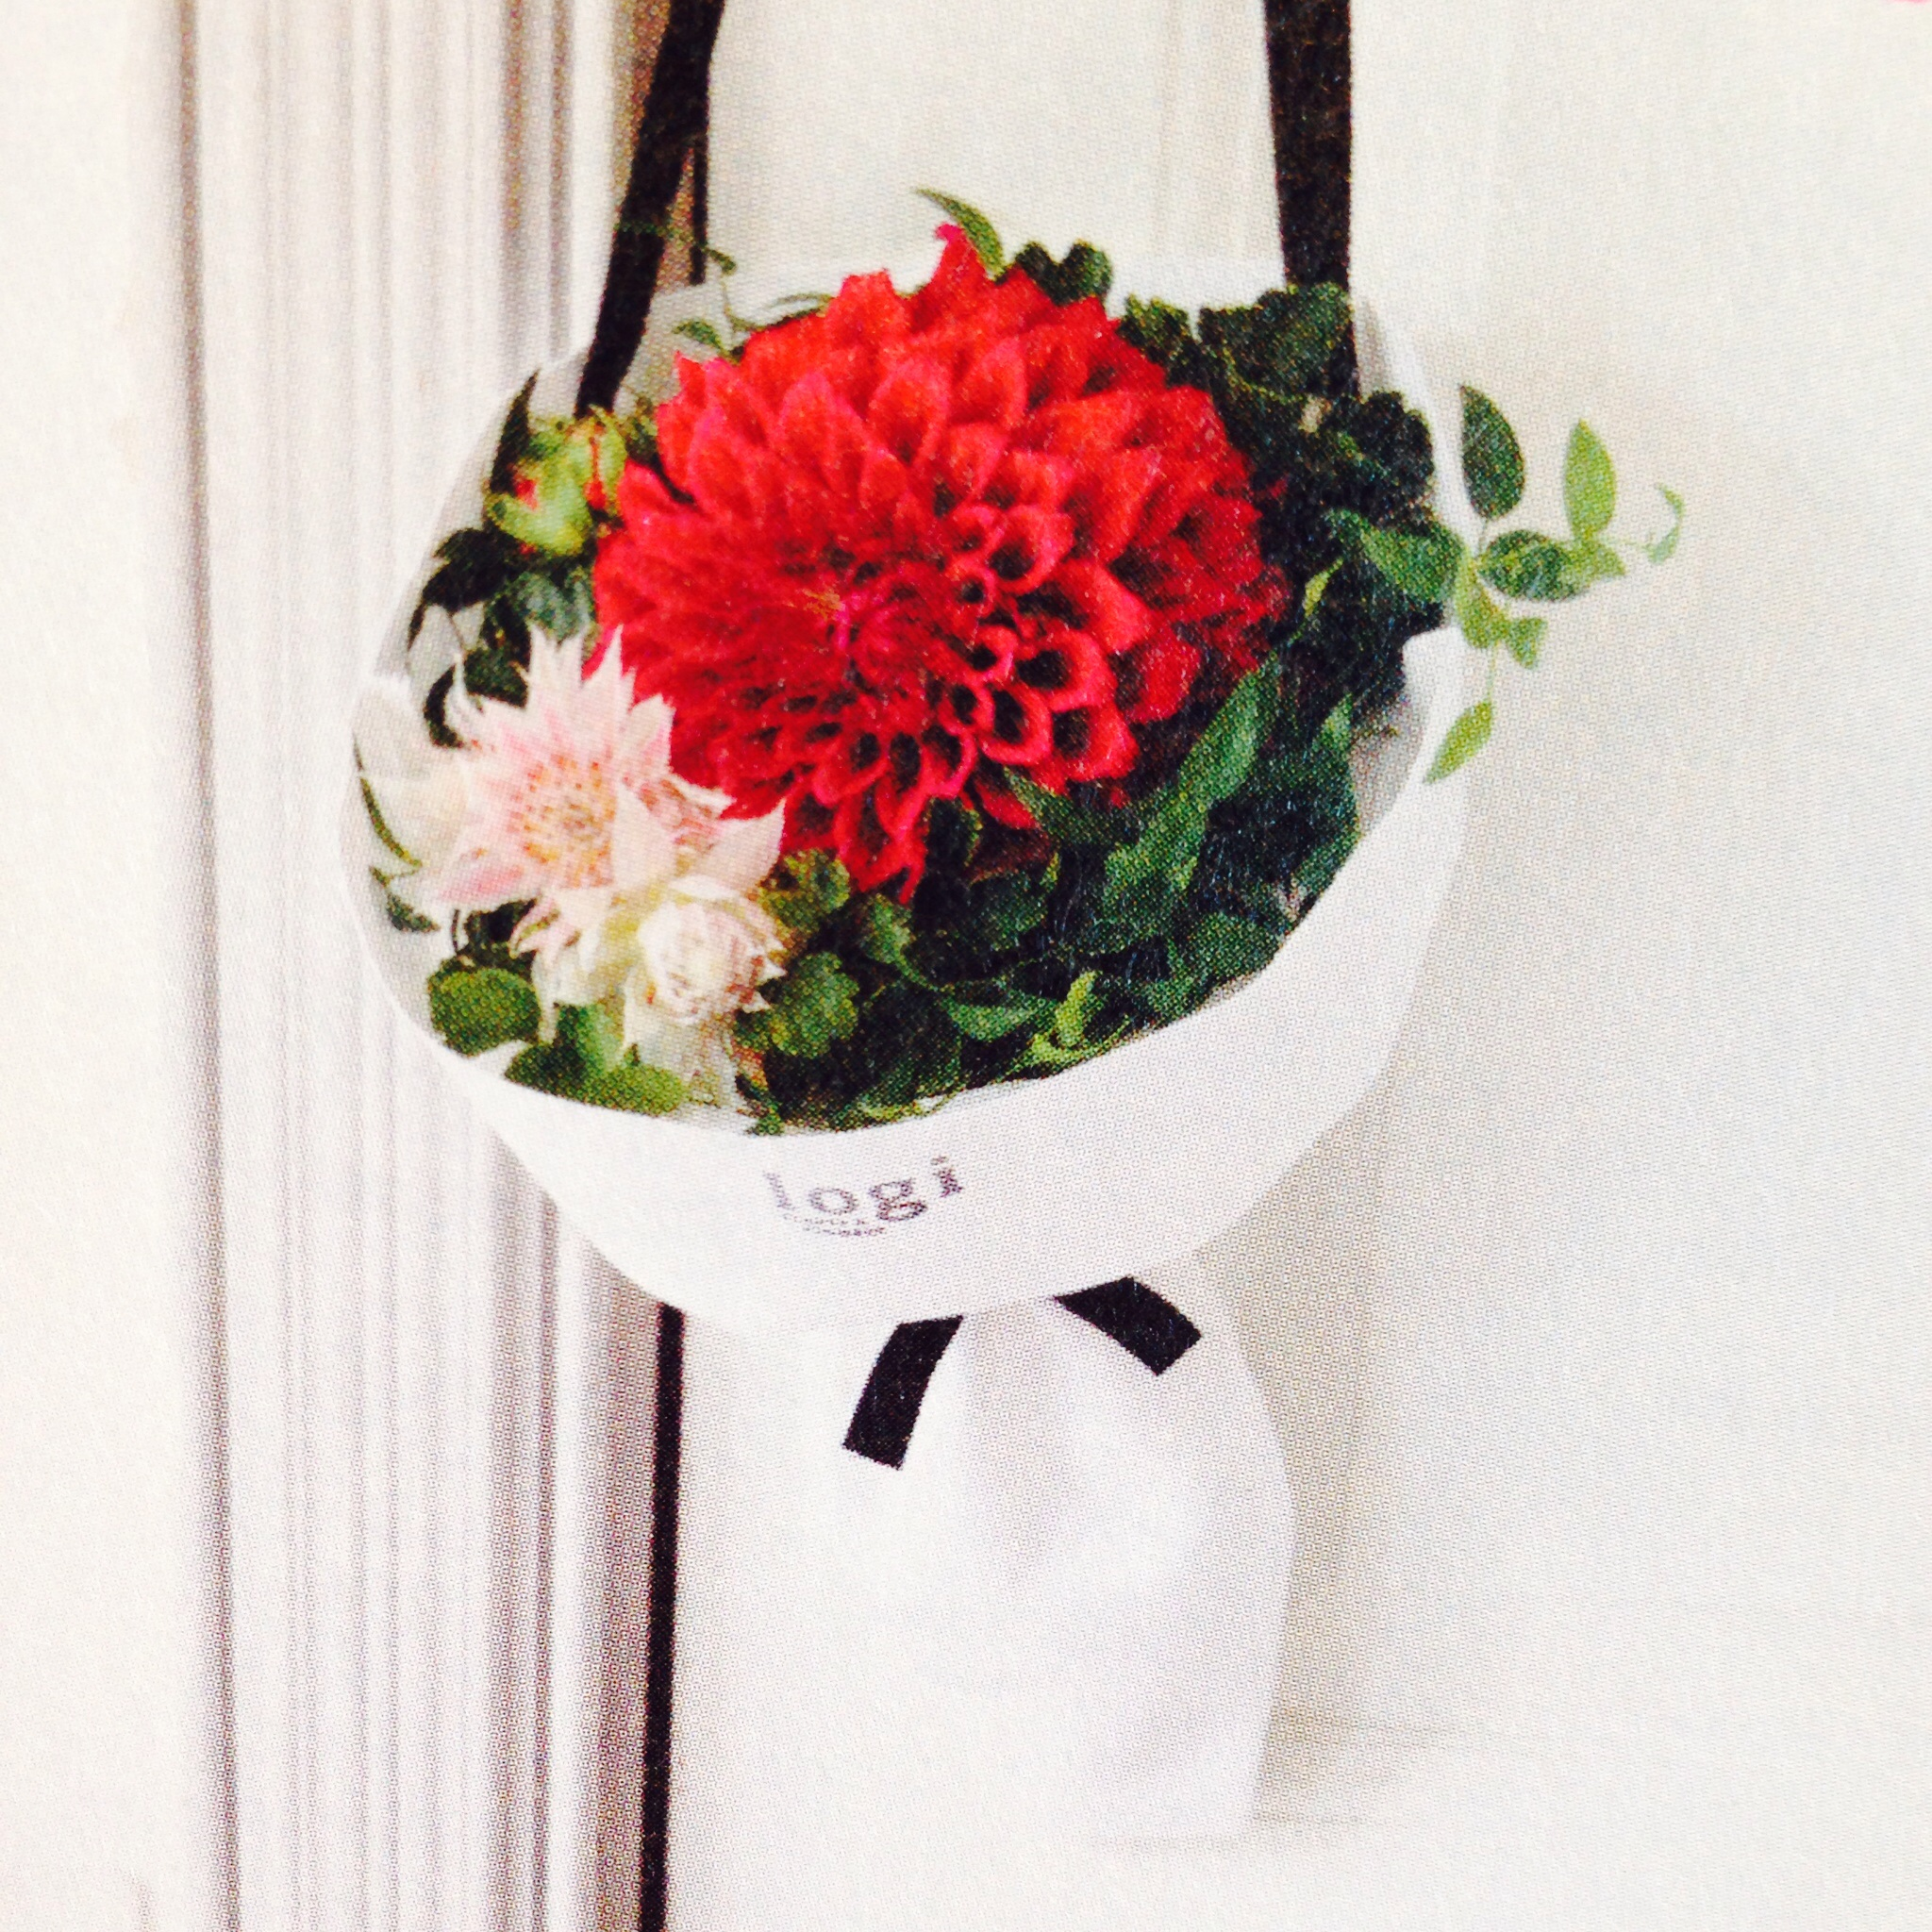 logi plant's&flowers 青山 自由が丘 フラワーバッグ